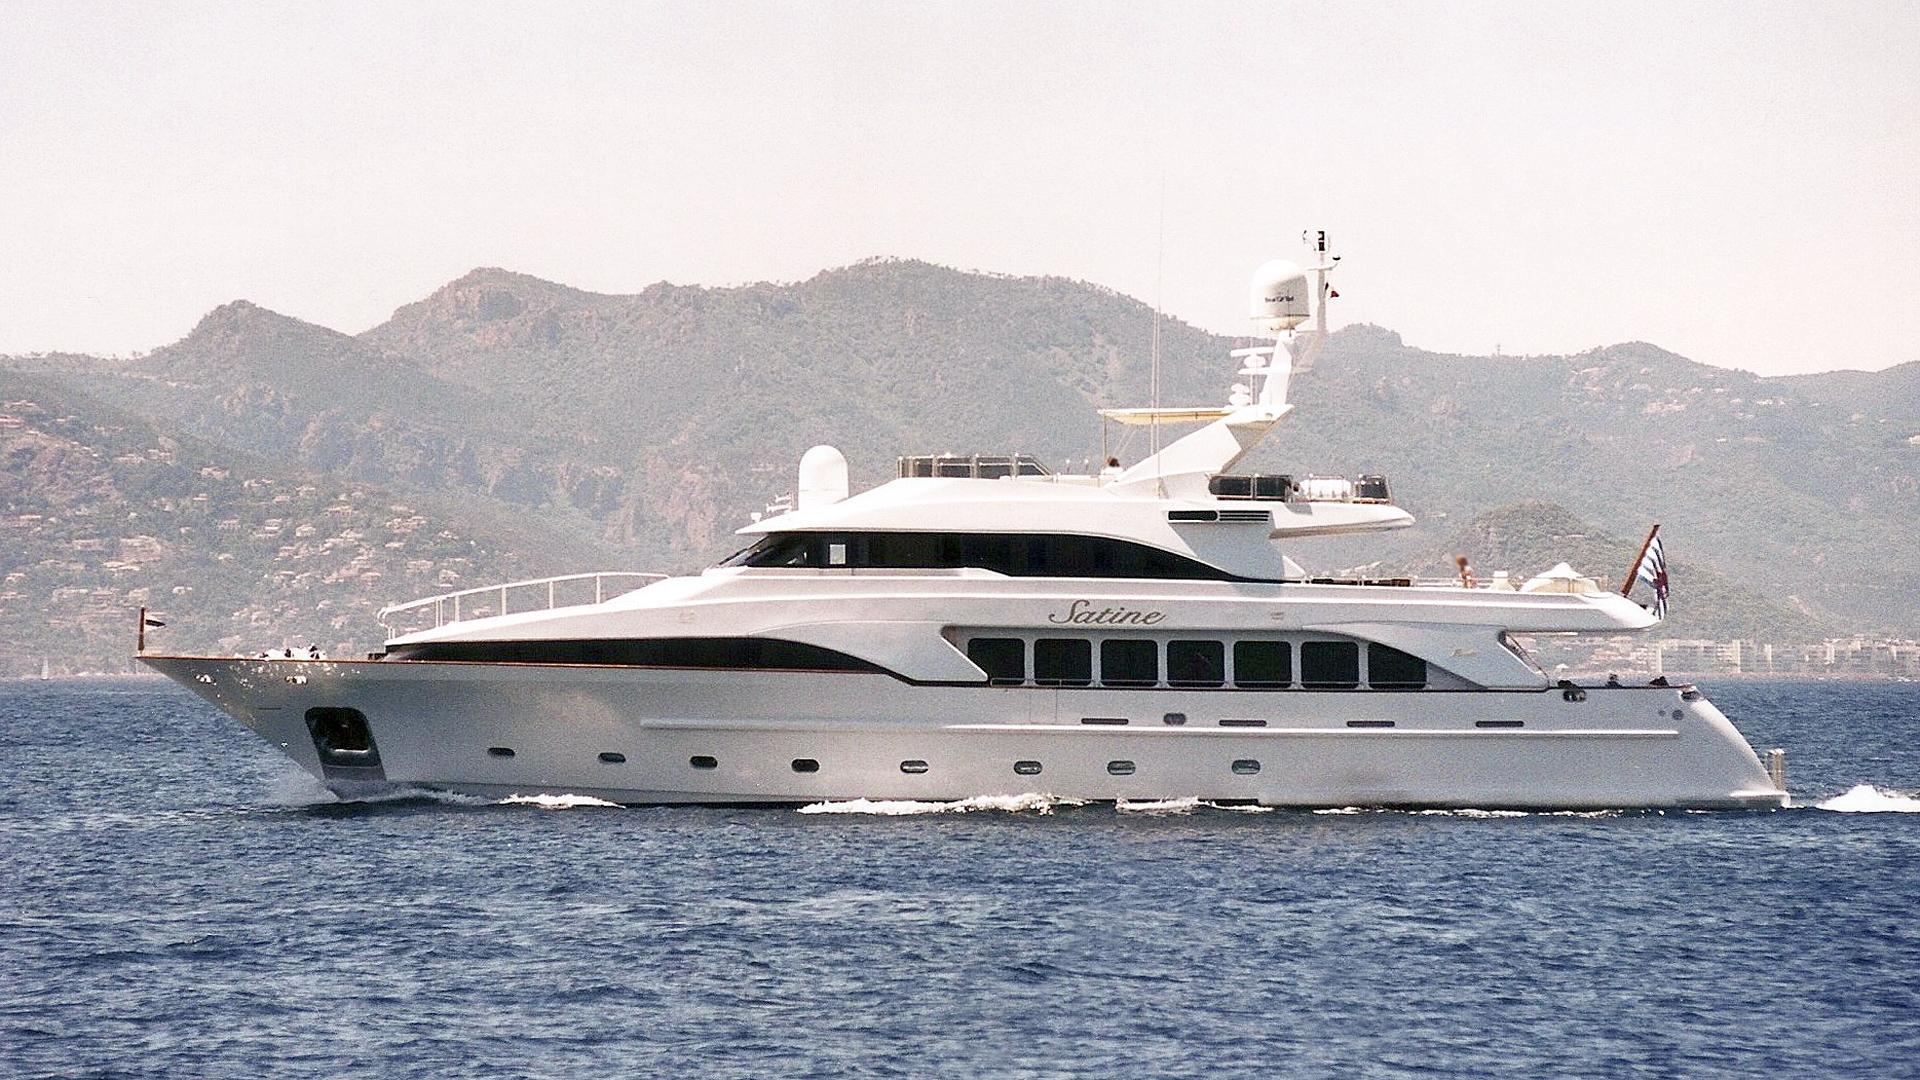 satine-motor-yacht-benetti-classic-115-2001-35m-profile